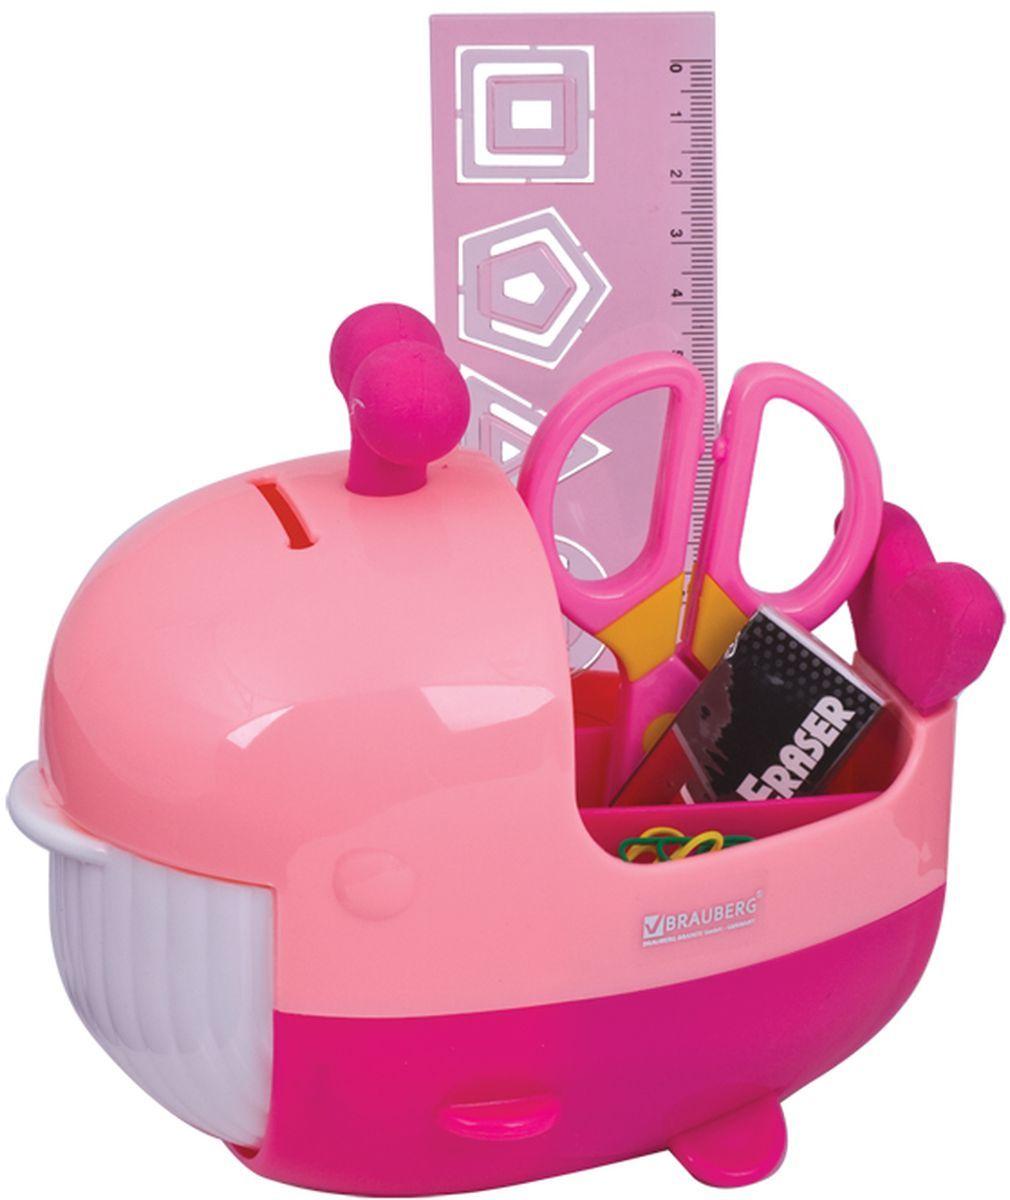 Brauberg Канцелярский набор Кит цвет розовый 4 предмета -  Органайзеры, настольные наборы